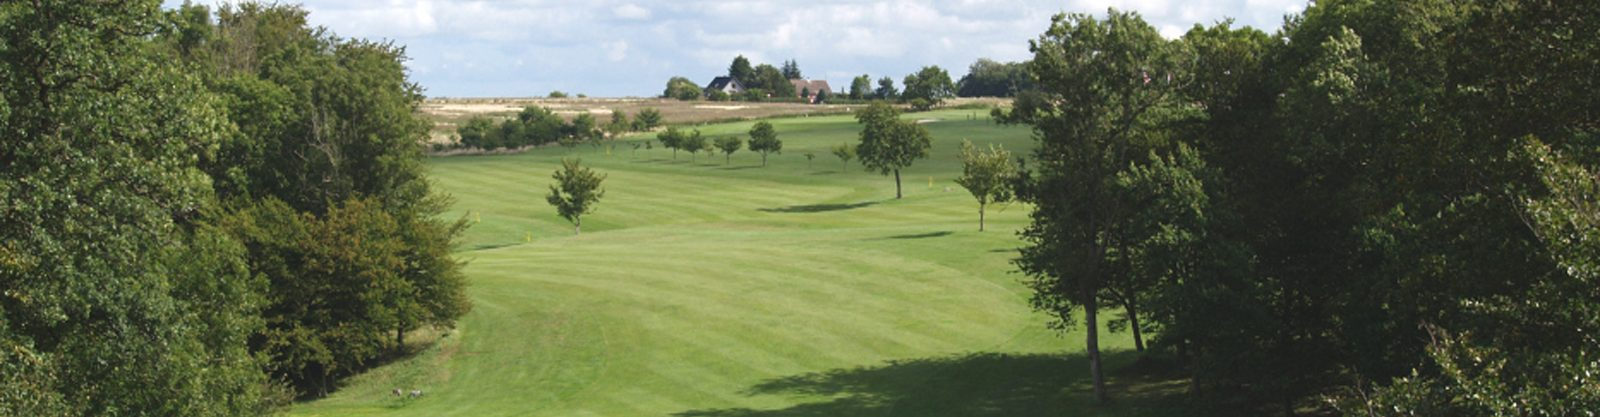 Nordbornholms Golfklub